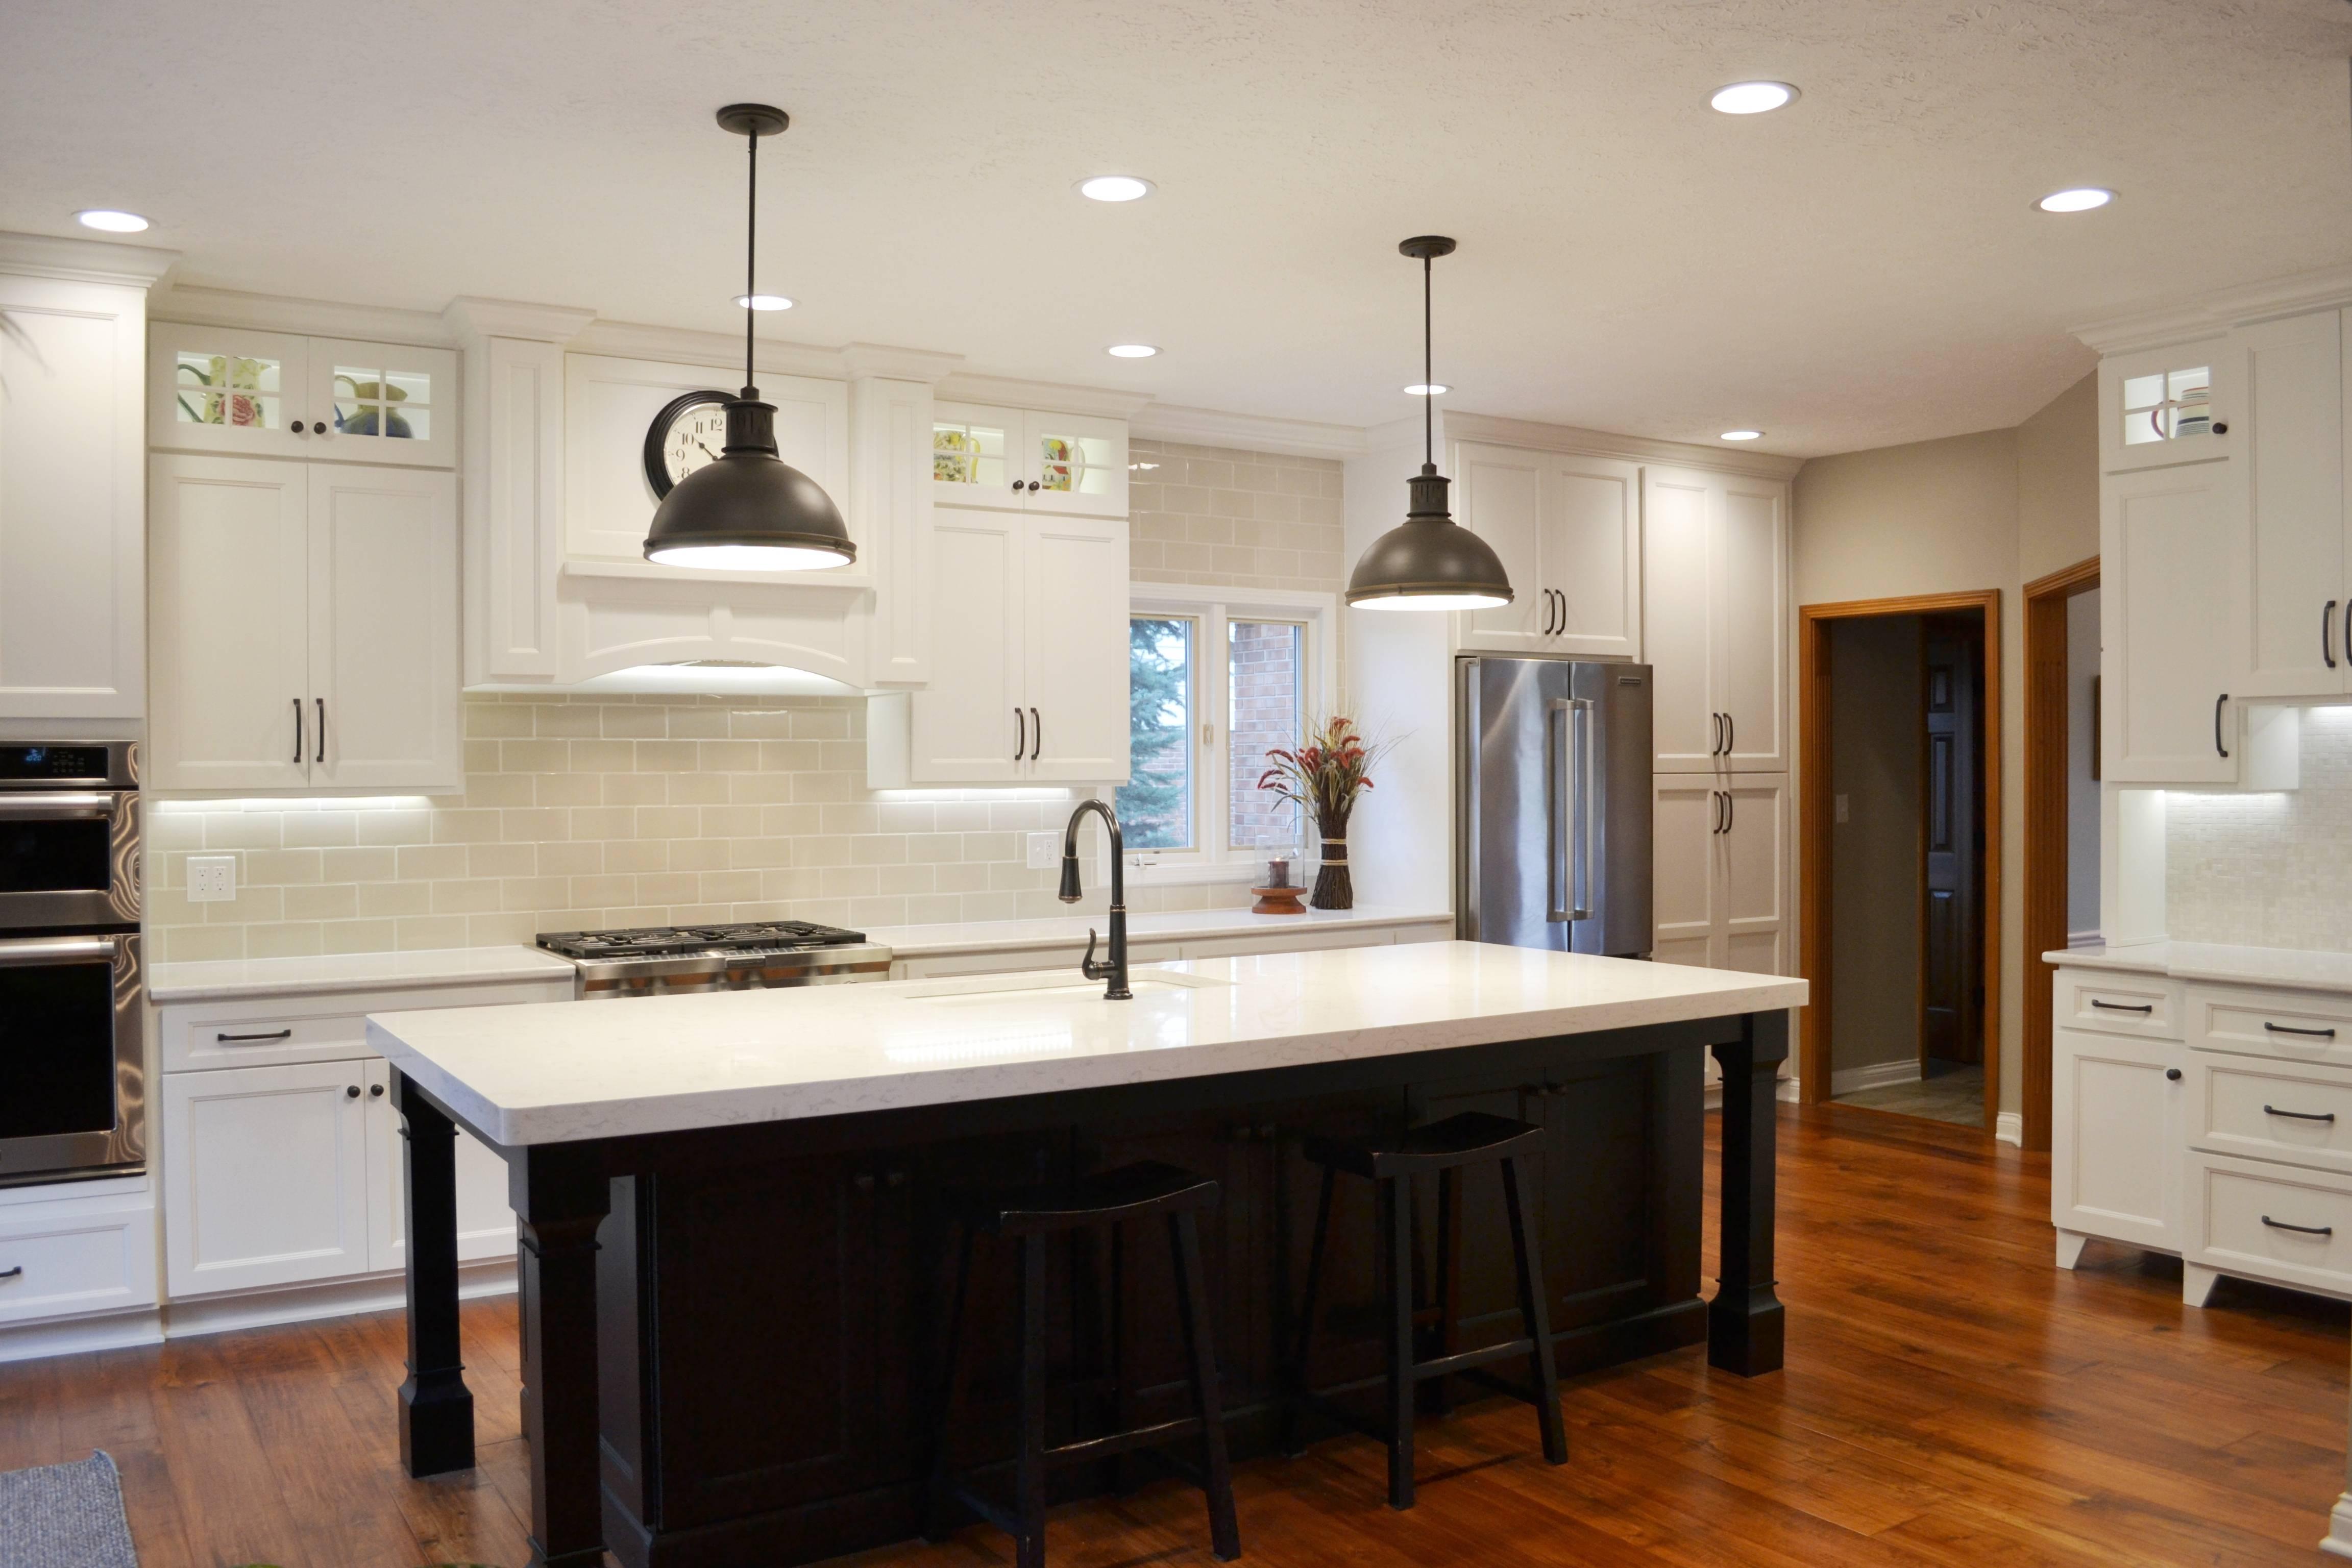 Kitchen Ideas: Kitchen Drop Lights Kitchen Ceiling Spotlights Inside Drop Pendant Lights For Kitchen (View 2 of 15)